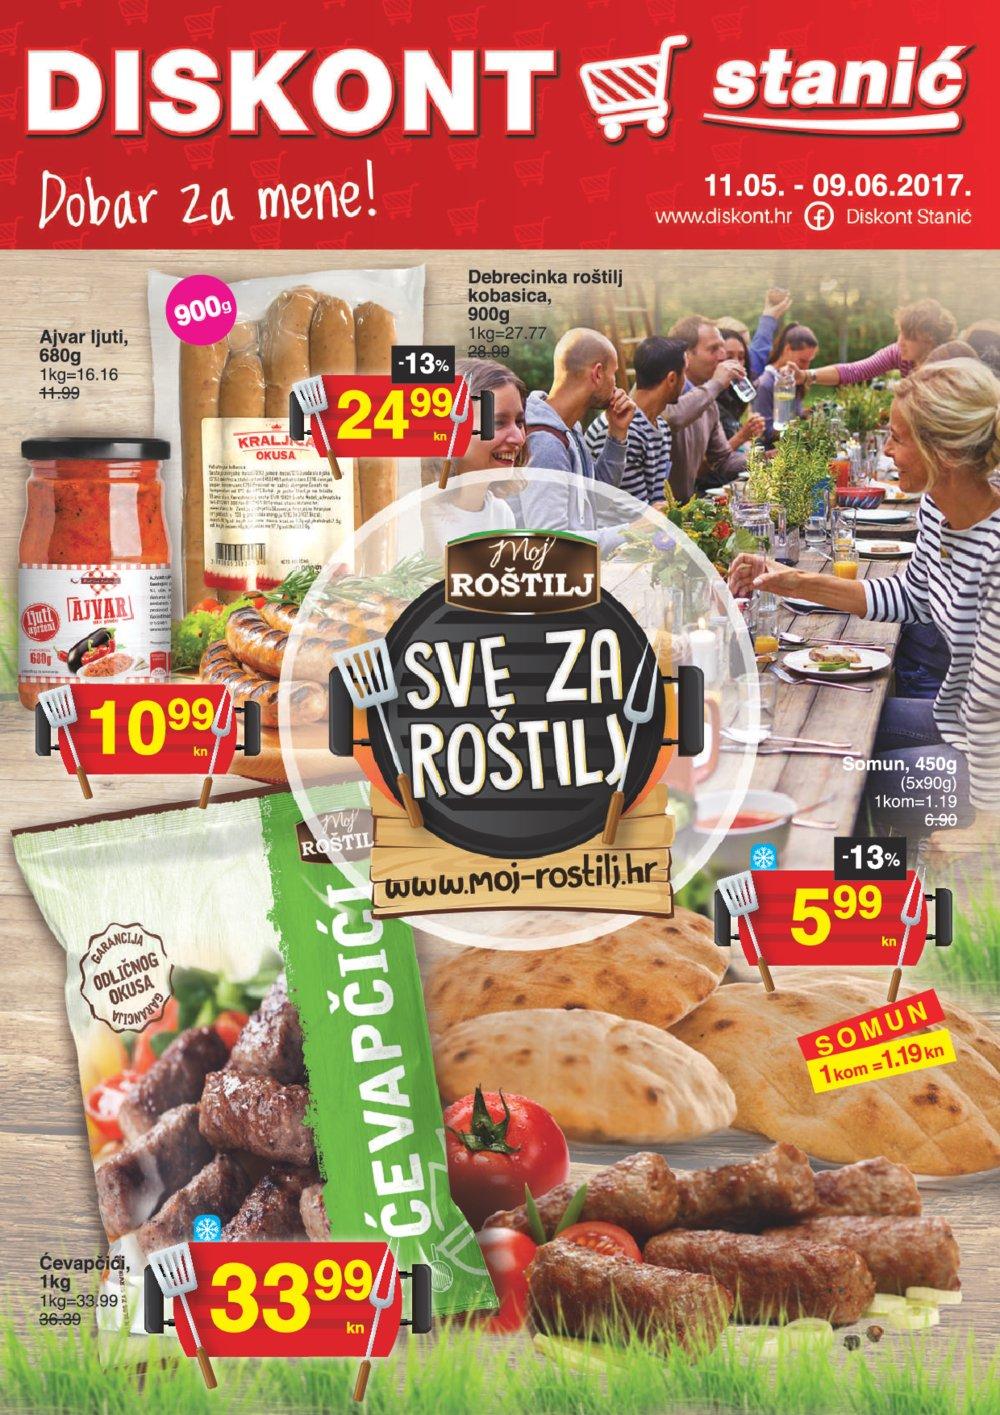 Stanić katalog roštilj 11.5 do 9.6.2017.